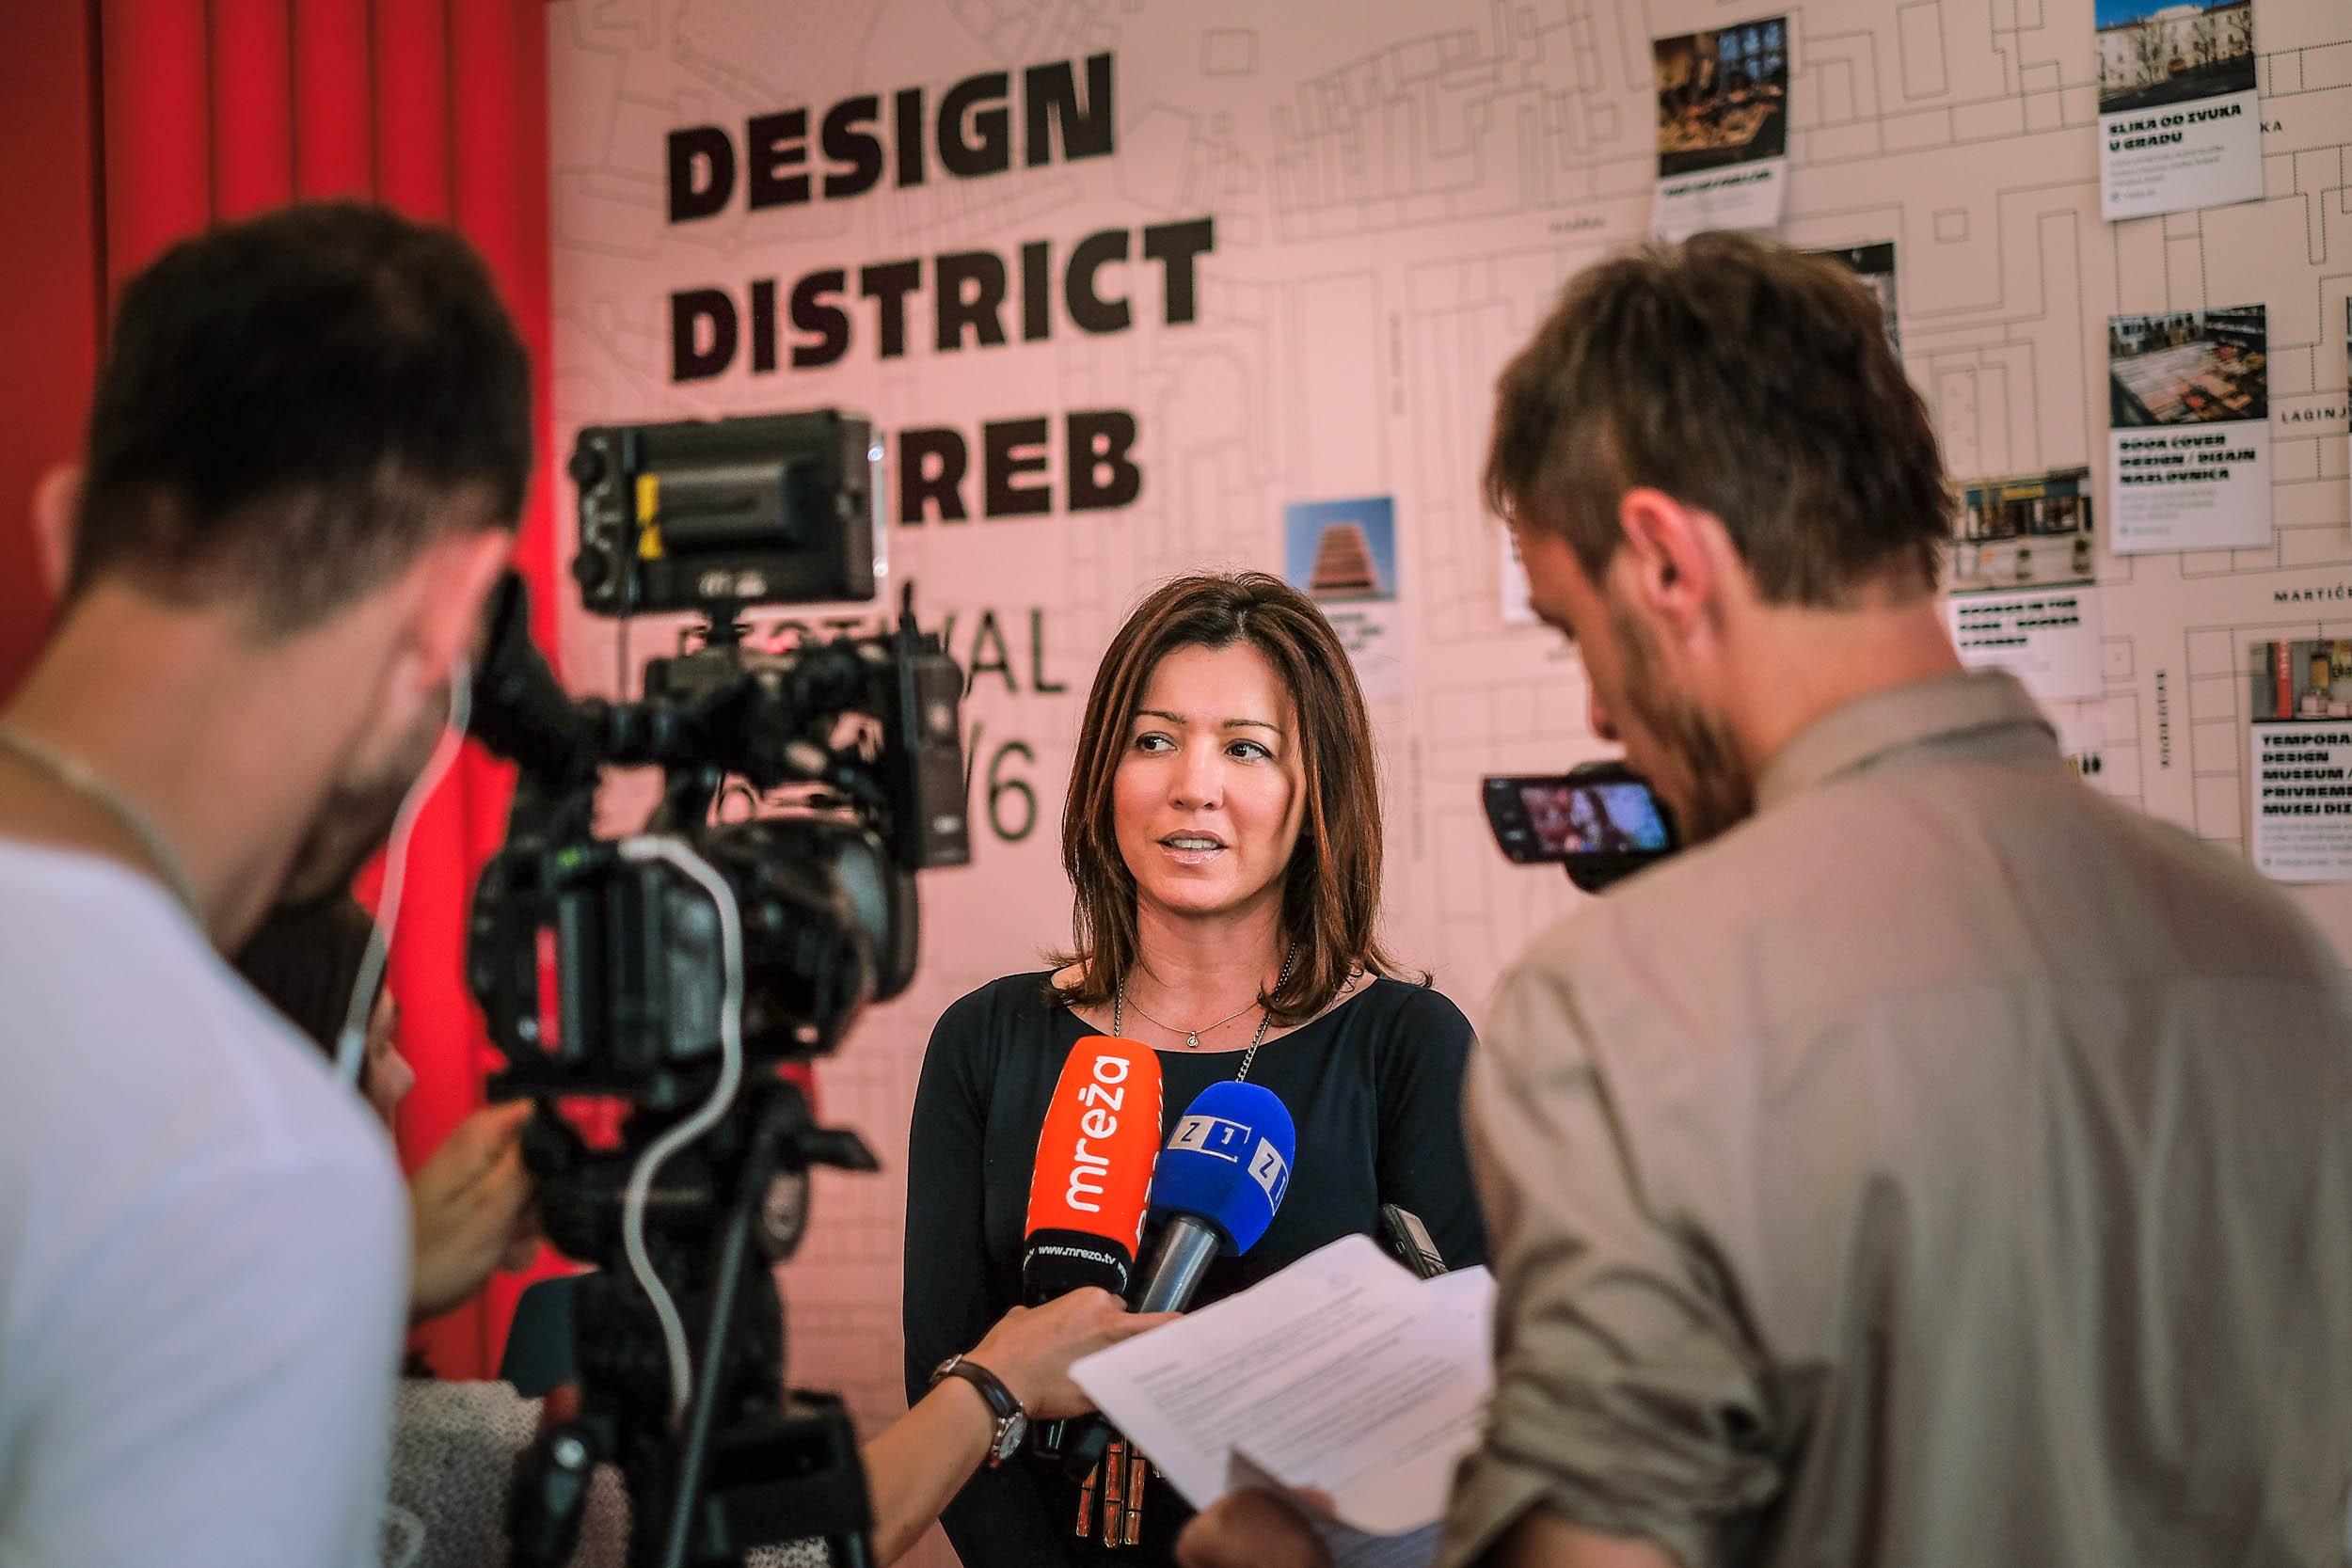 Martina Bienenfeld, director of the Tourist Board of Zagreb (photo: Sanjin Kastelan)